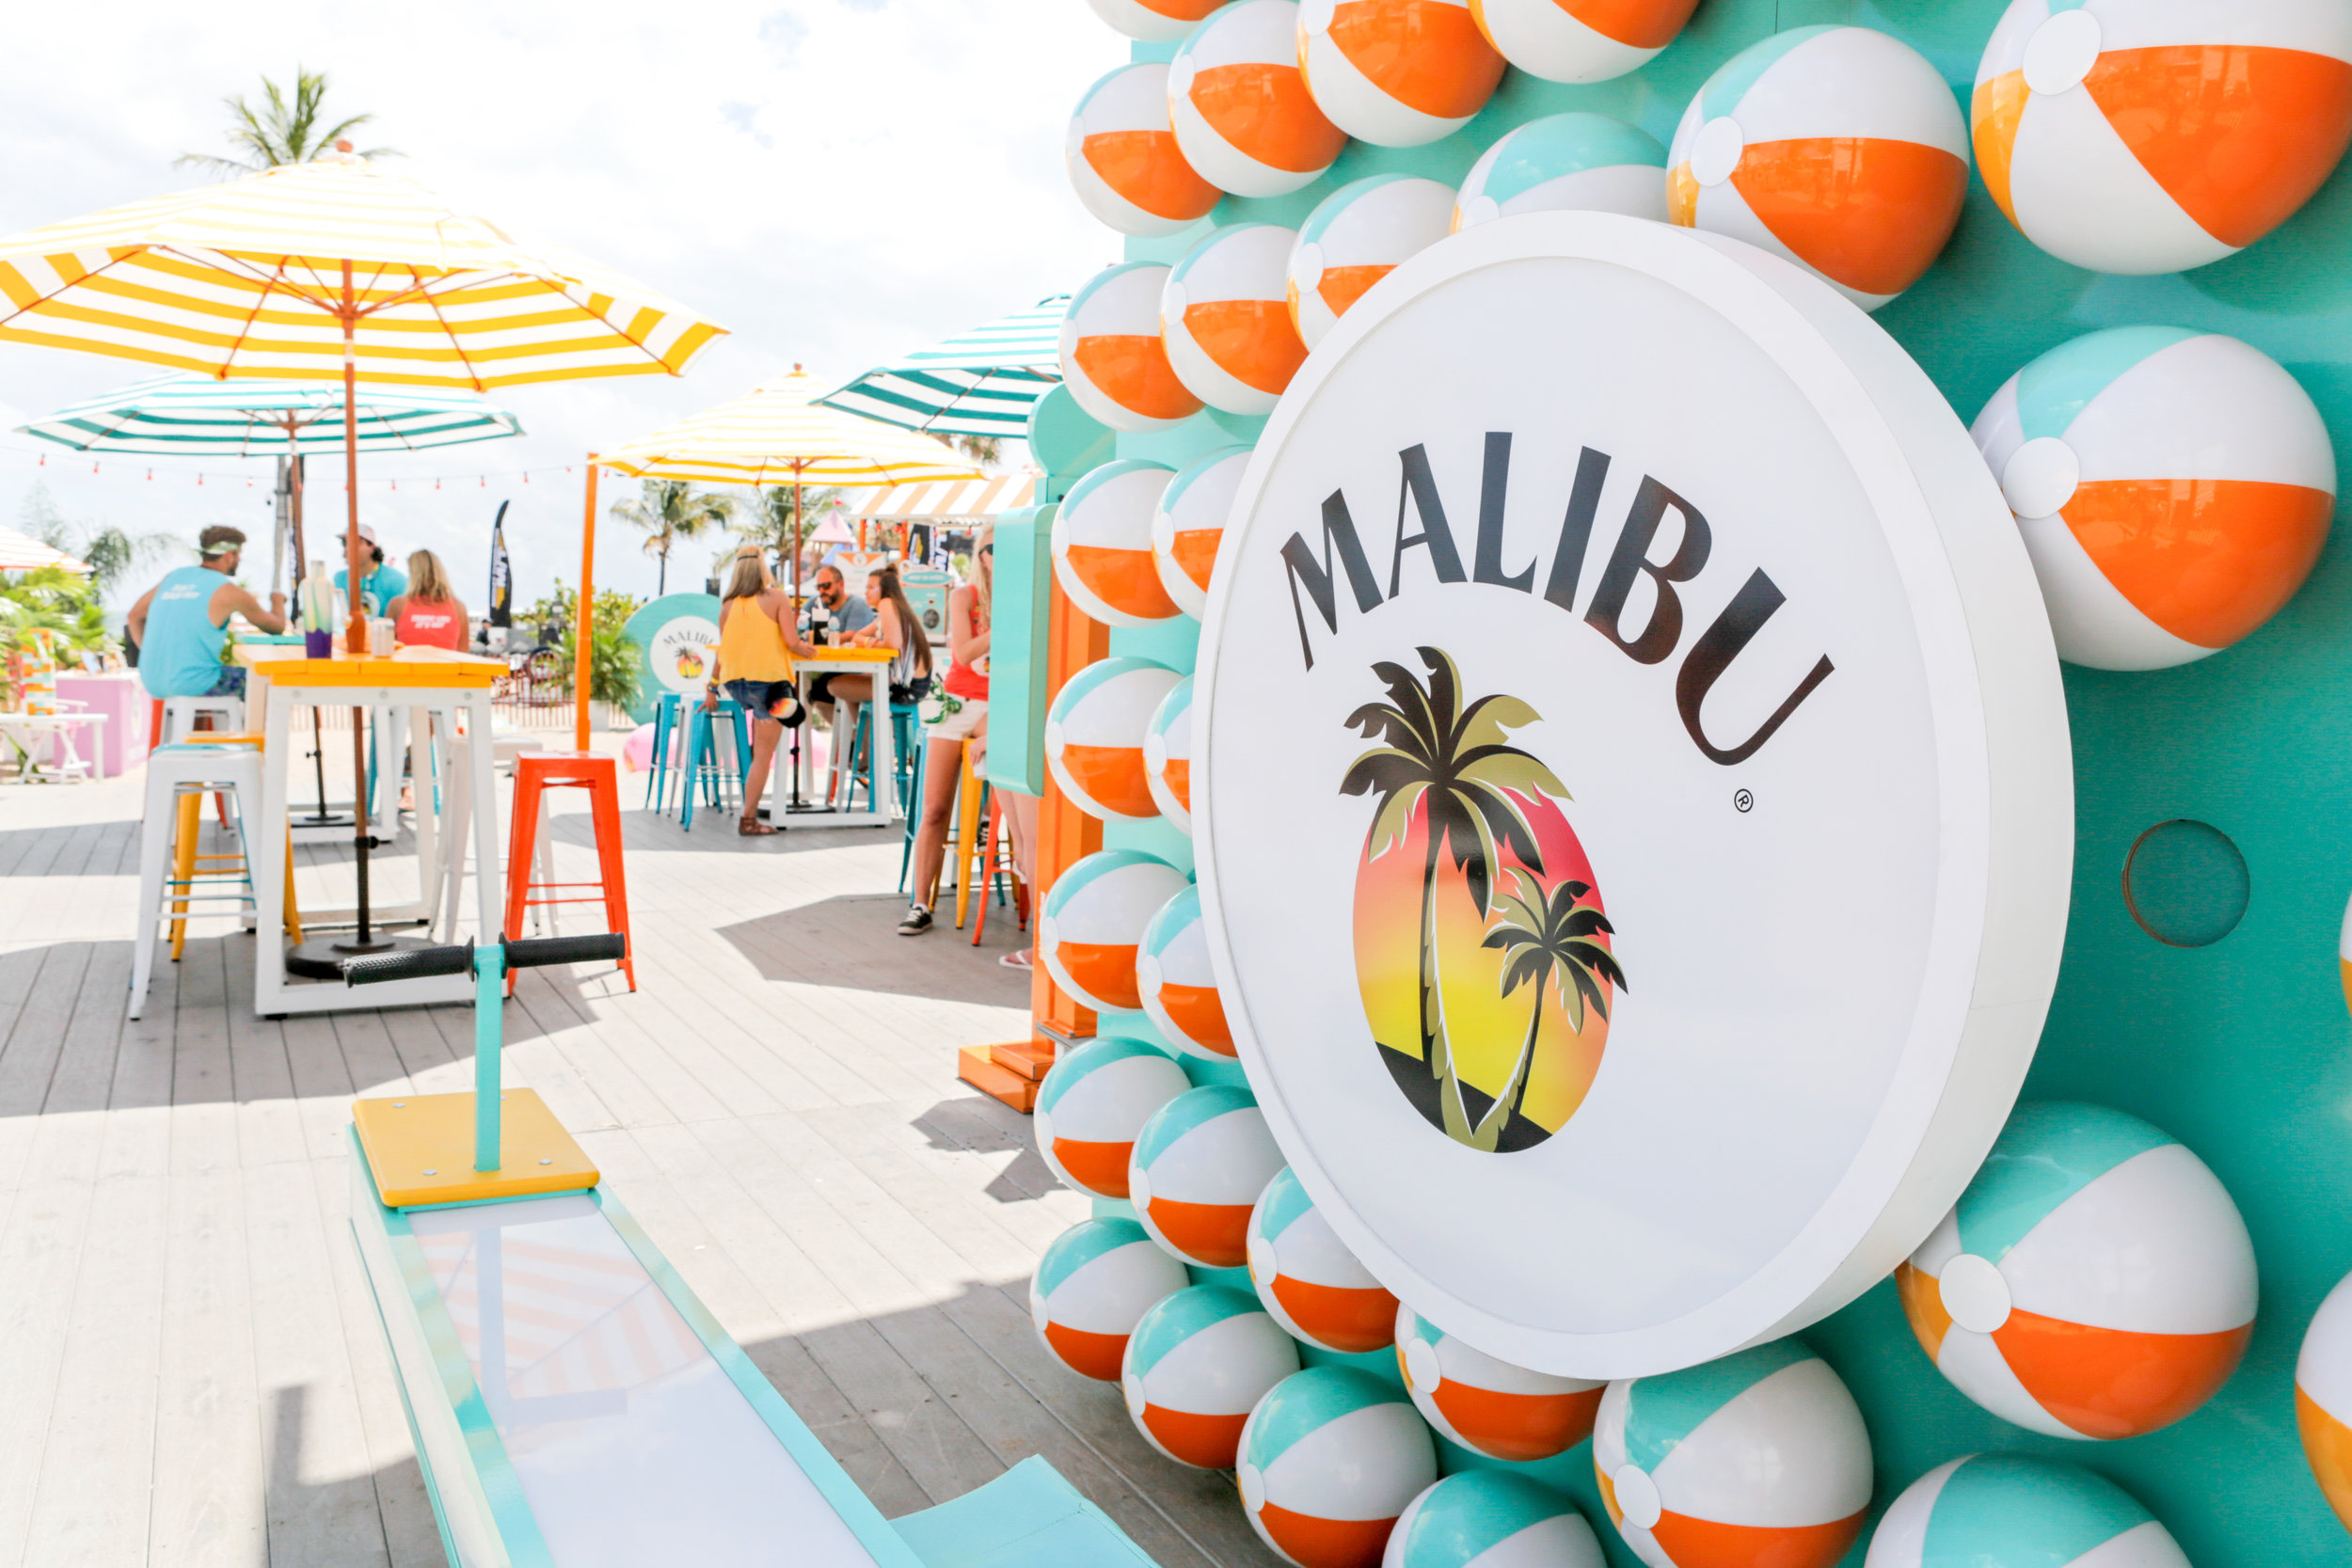 OHelloMedia-Malibu@TortugaFestival-TopSelect-0729.jpg